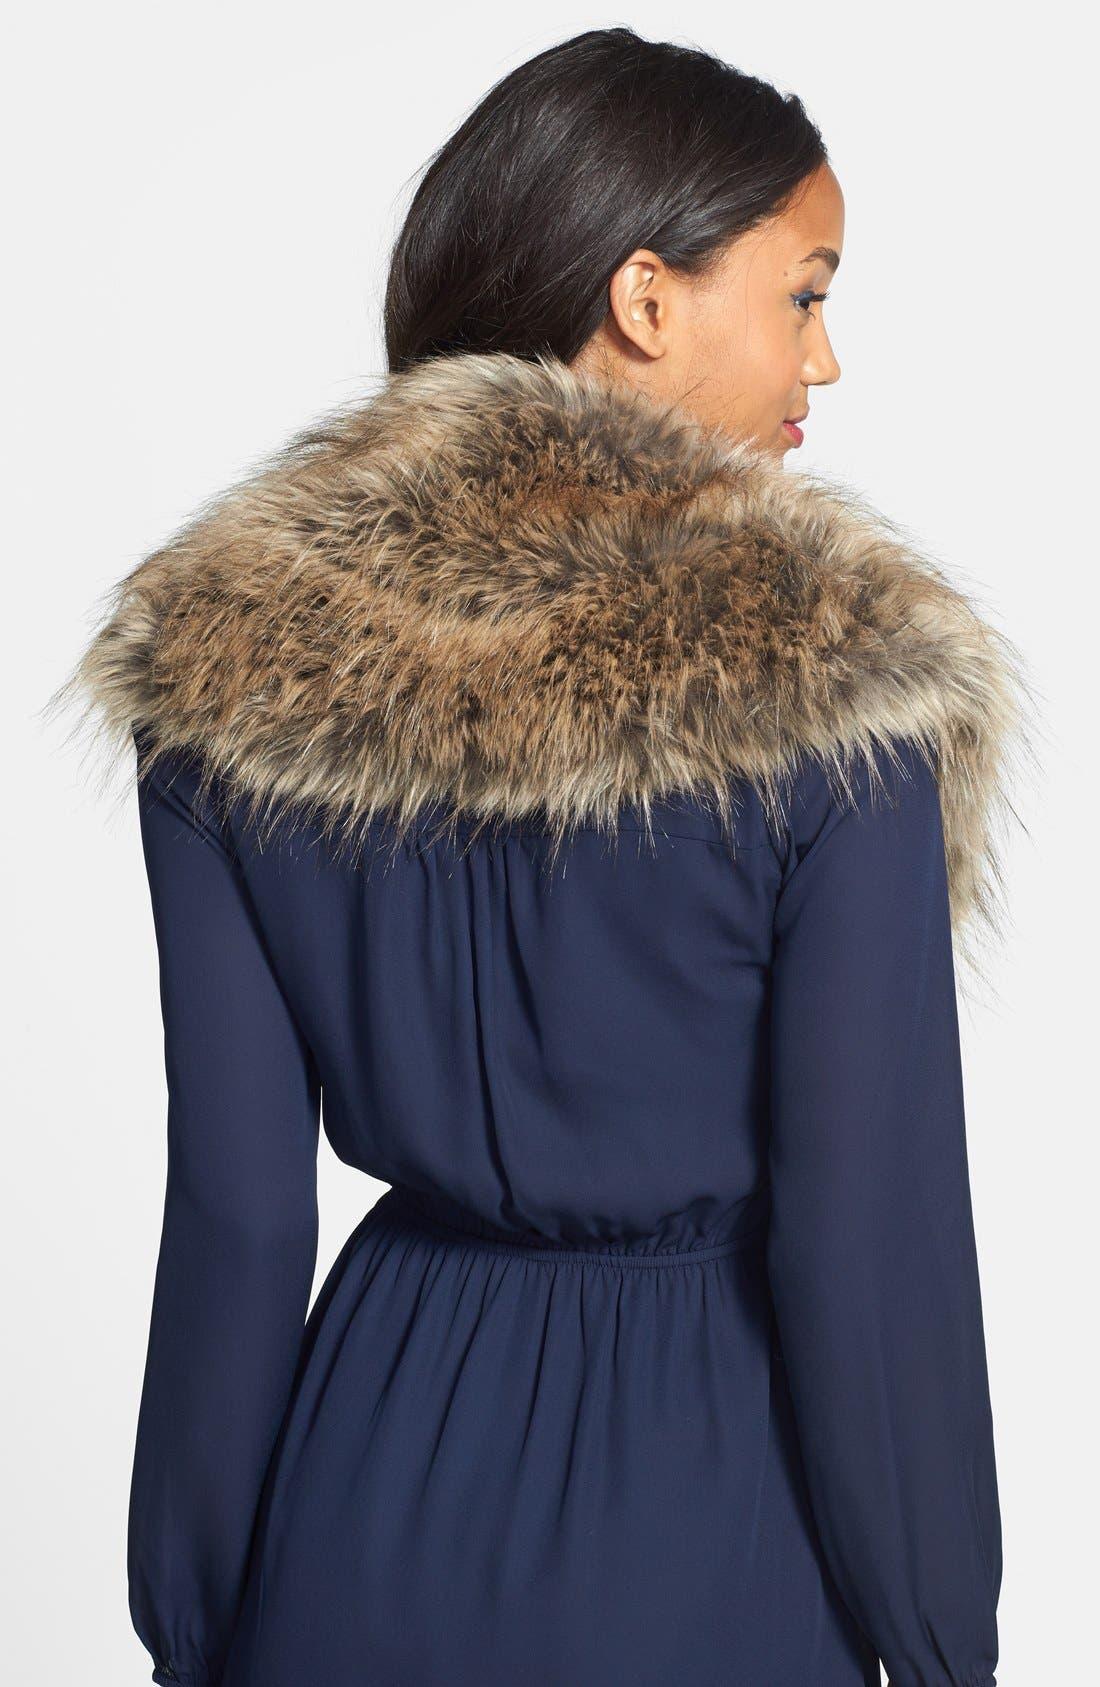 BP.,                             Oversized Faux Fur Collar,                             Alternate thumbnail 3, color,                             250